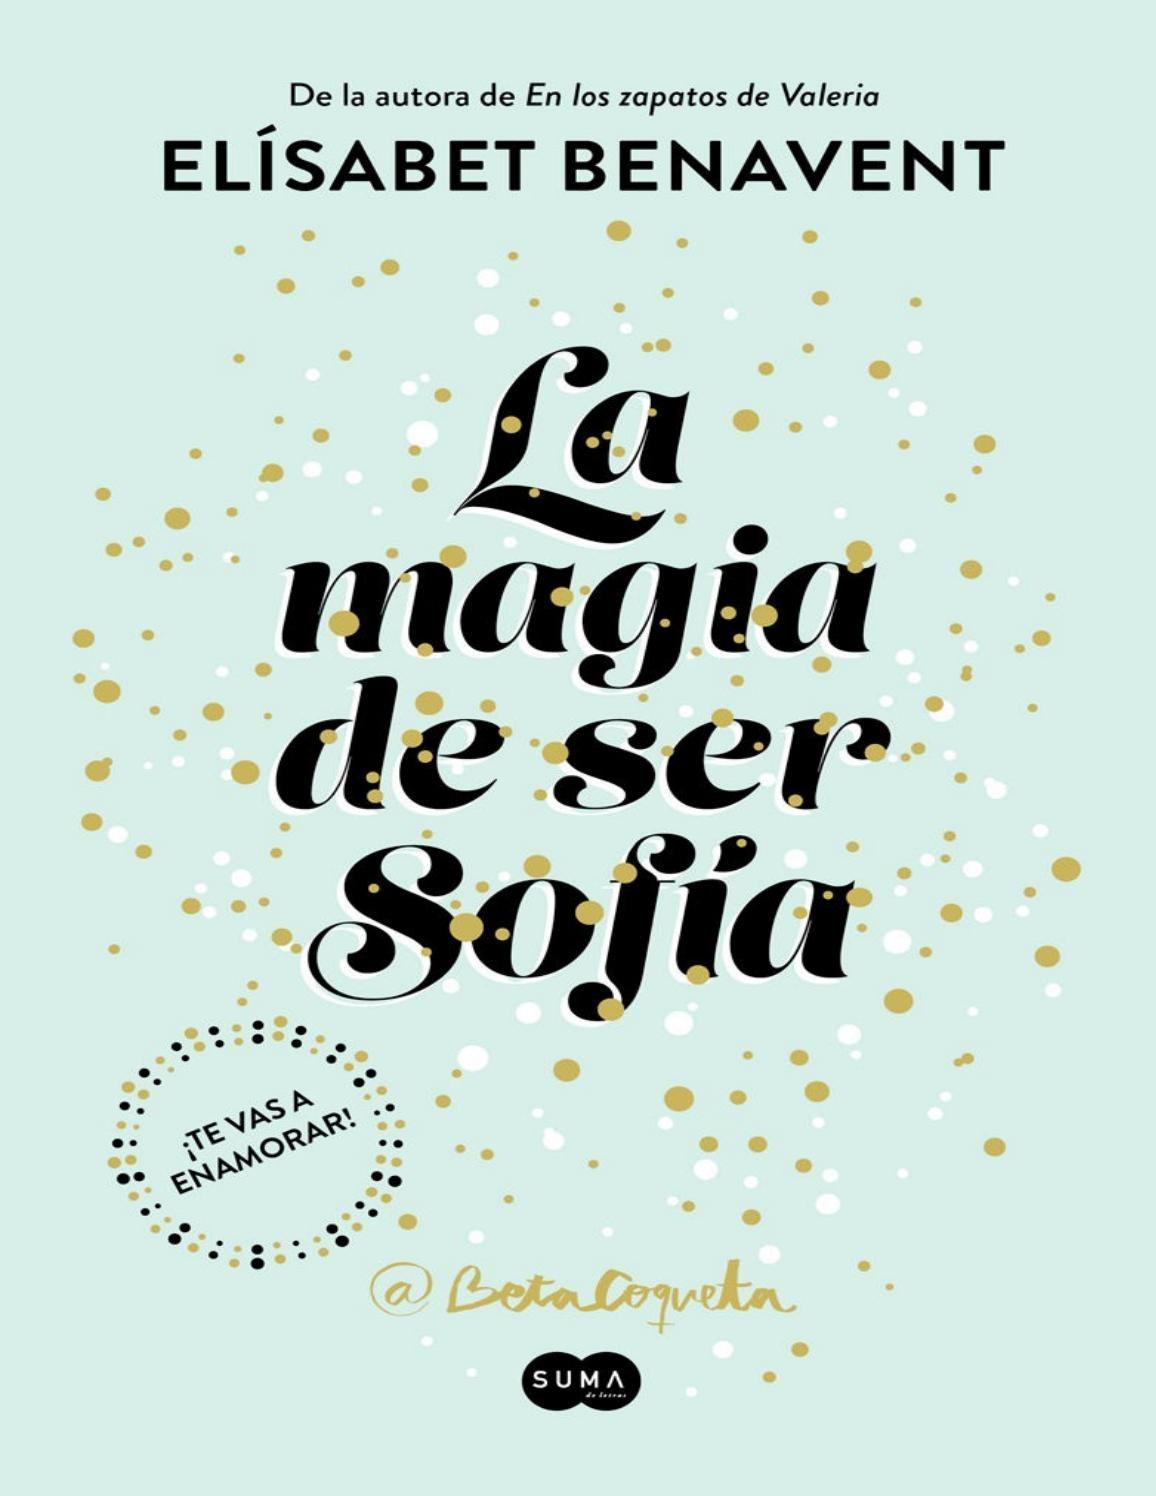 Conocer gente Ourense tucuman